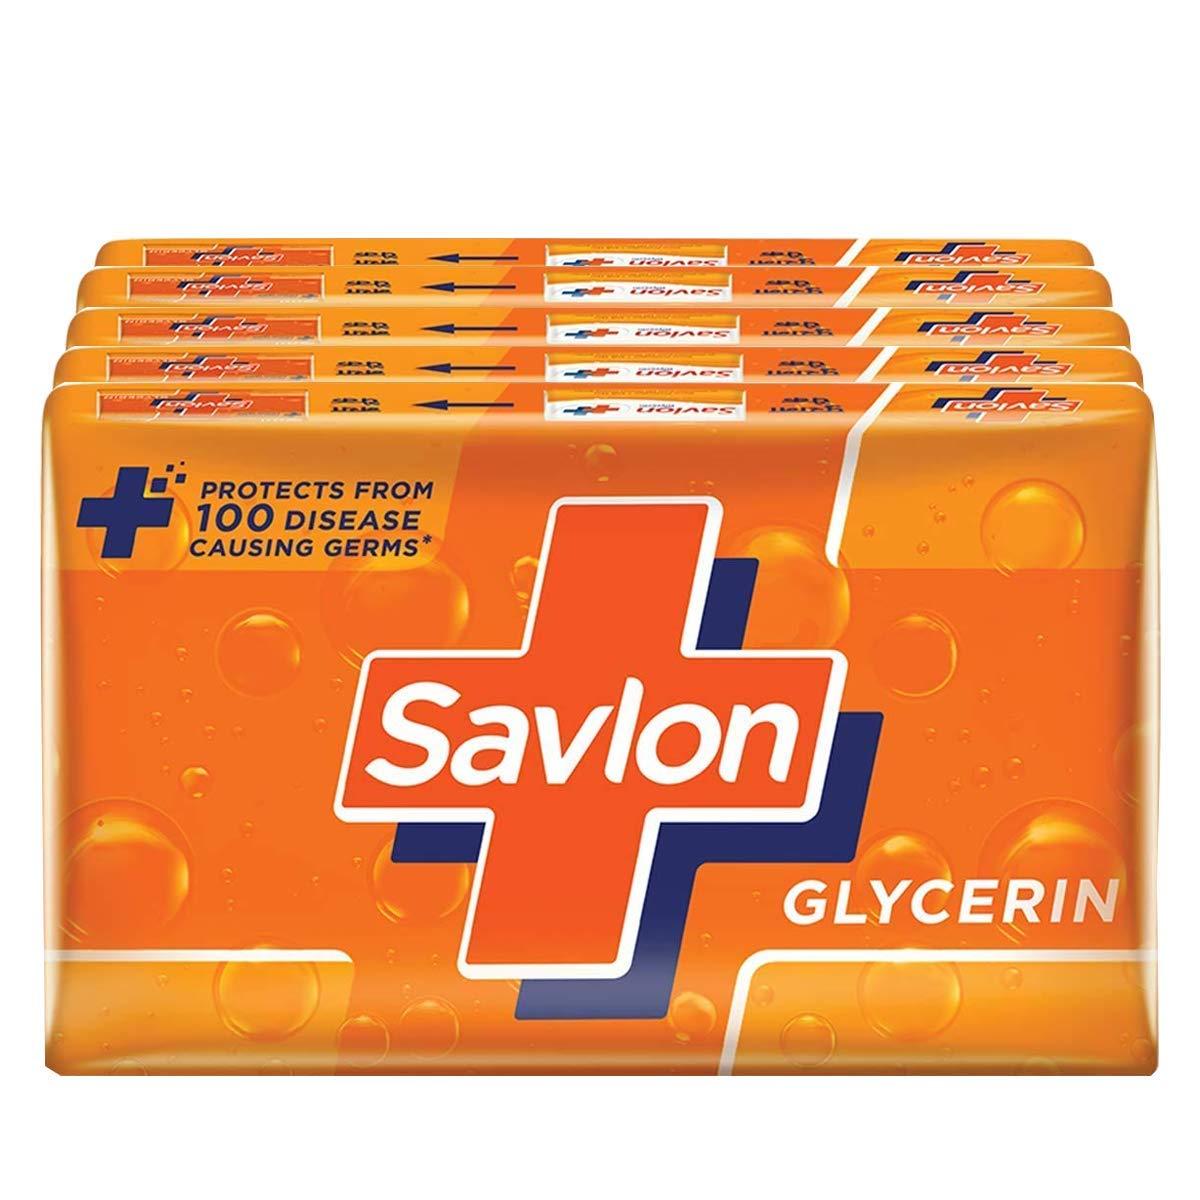 Savlon Glycerin Soap Bar, 125g (Pack of 5)